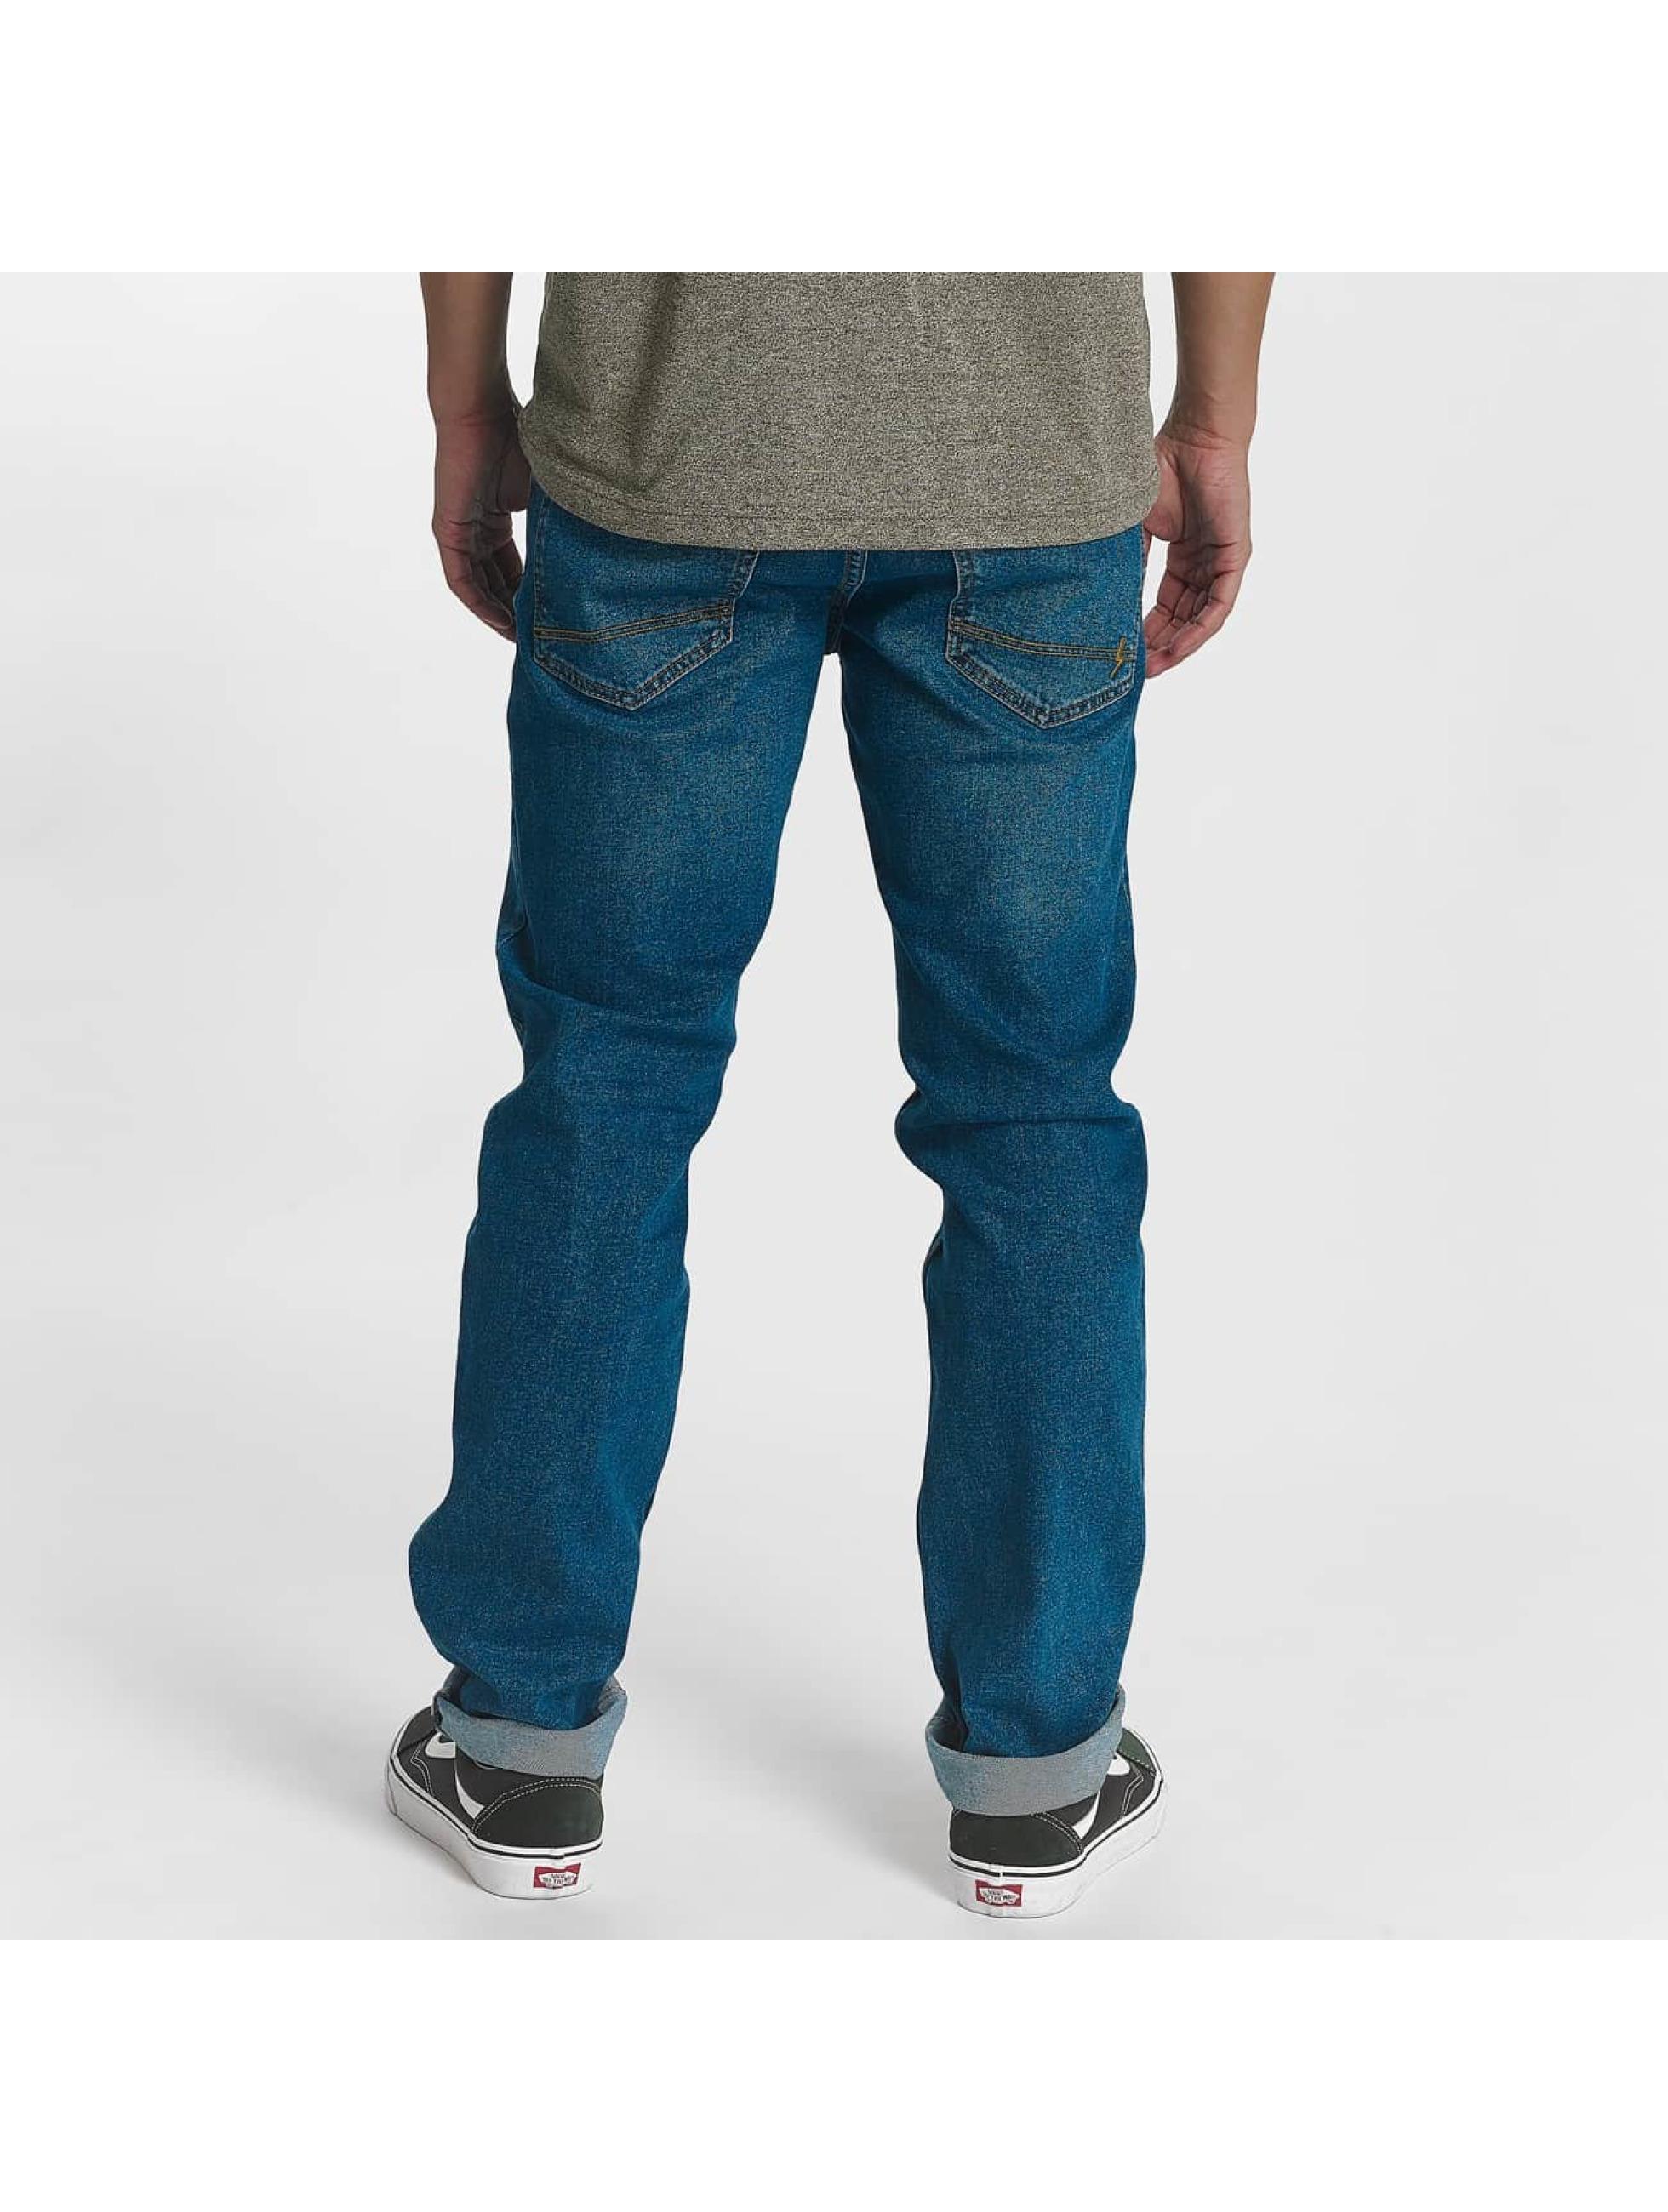 Reell Jeans Vaqueros rectos Nova II azul